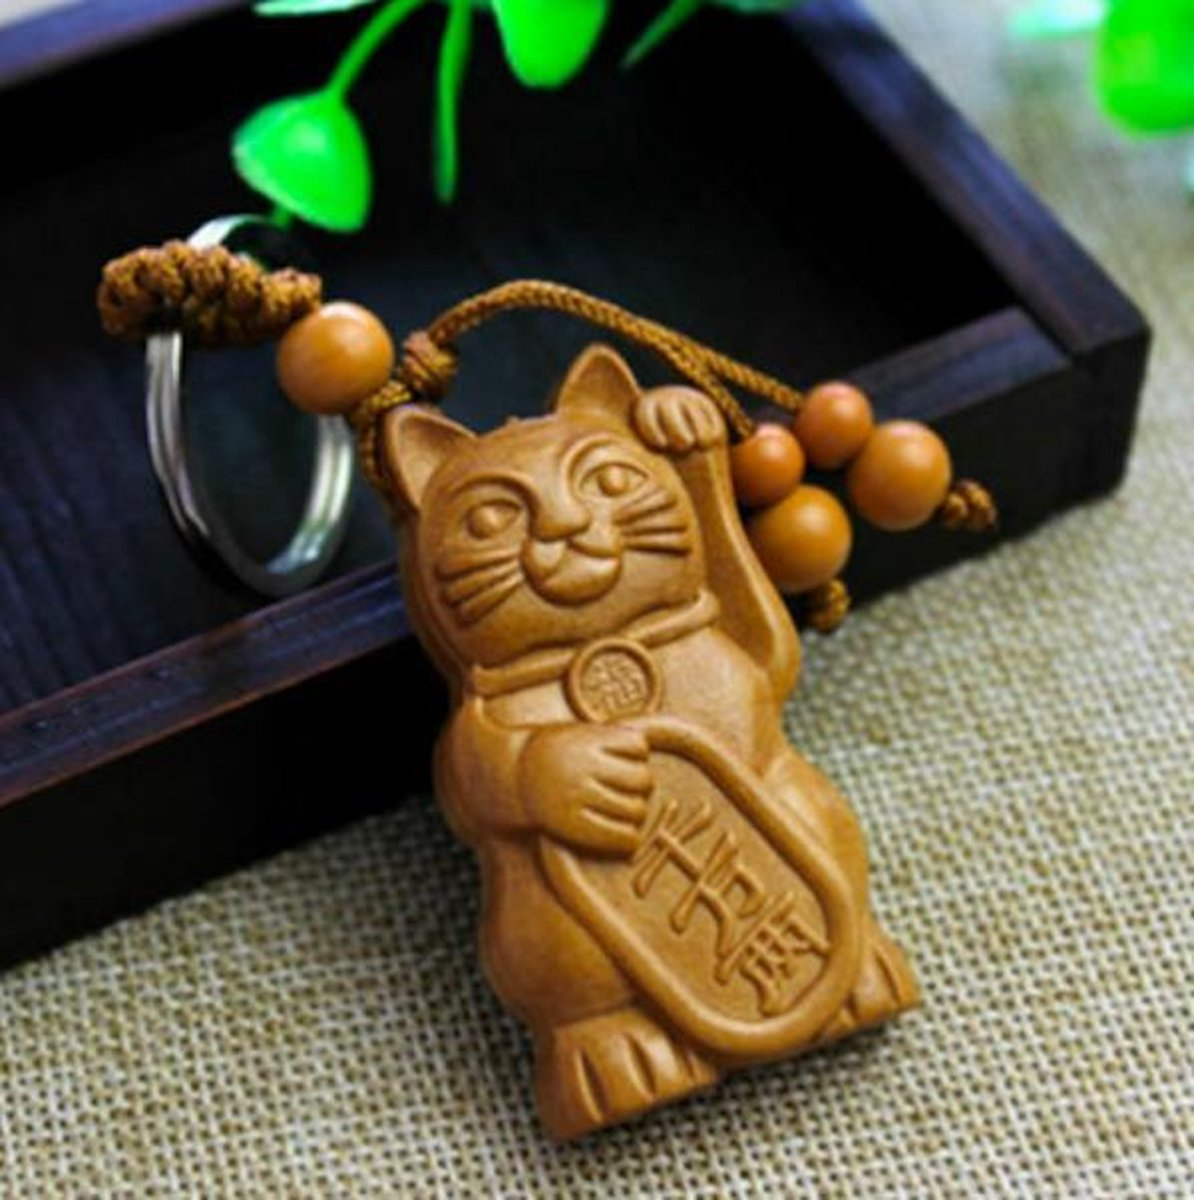 Japanse Gelukskat Maneki Neko sleutelhanger / Geluksbrenger van Welvaart en Voorspoed / Japanese Fortune Cat / Keychain